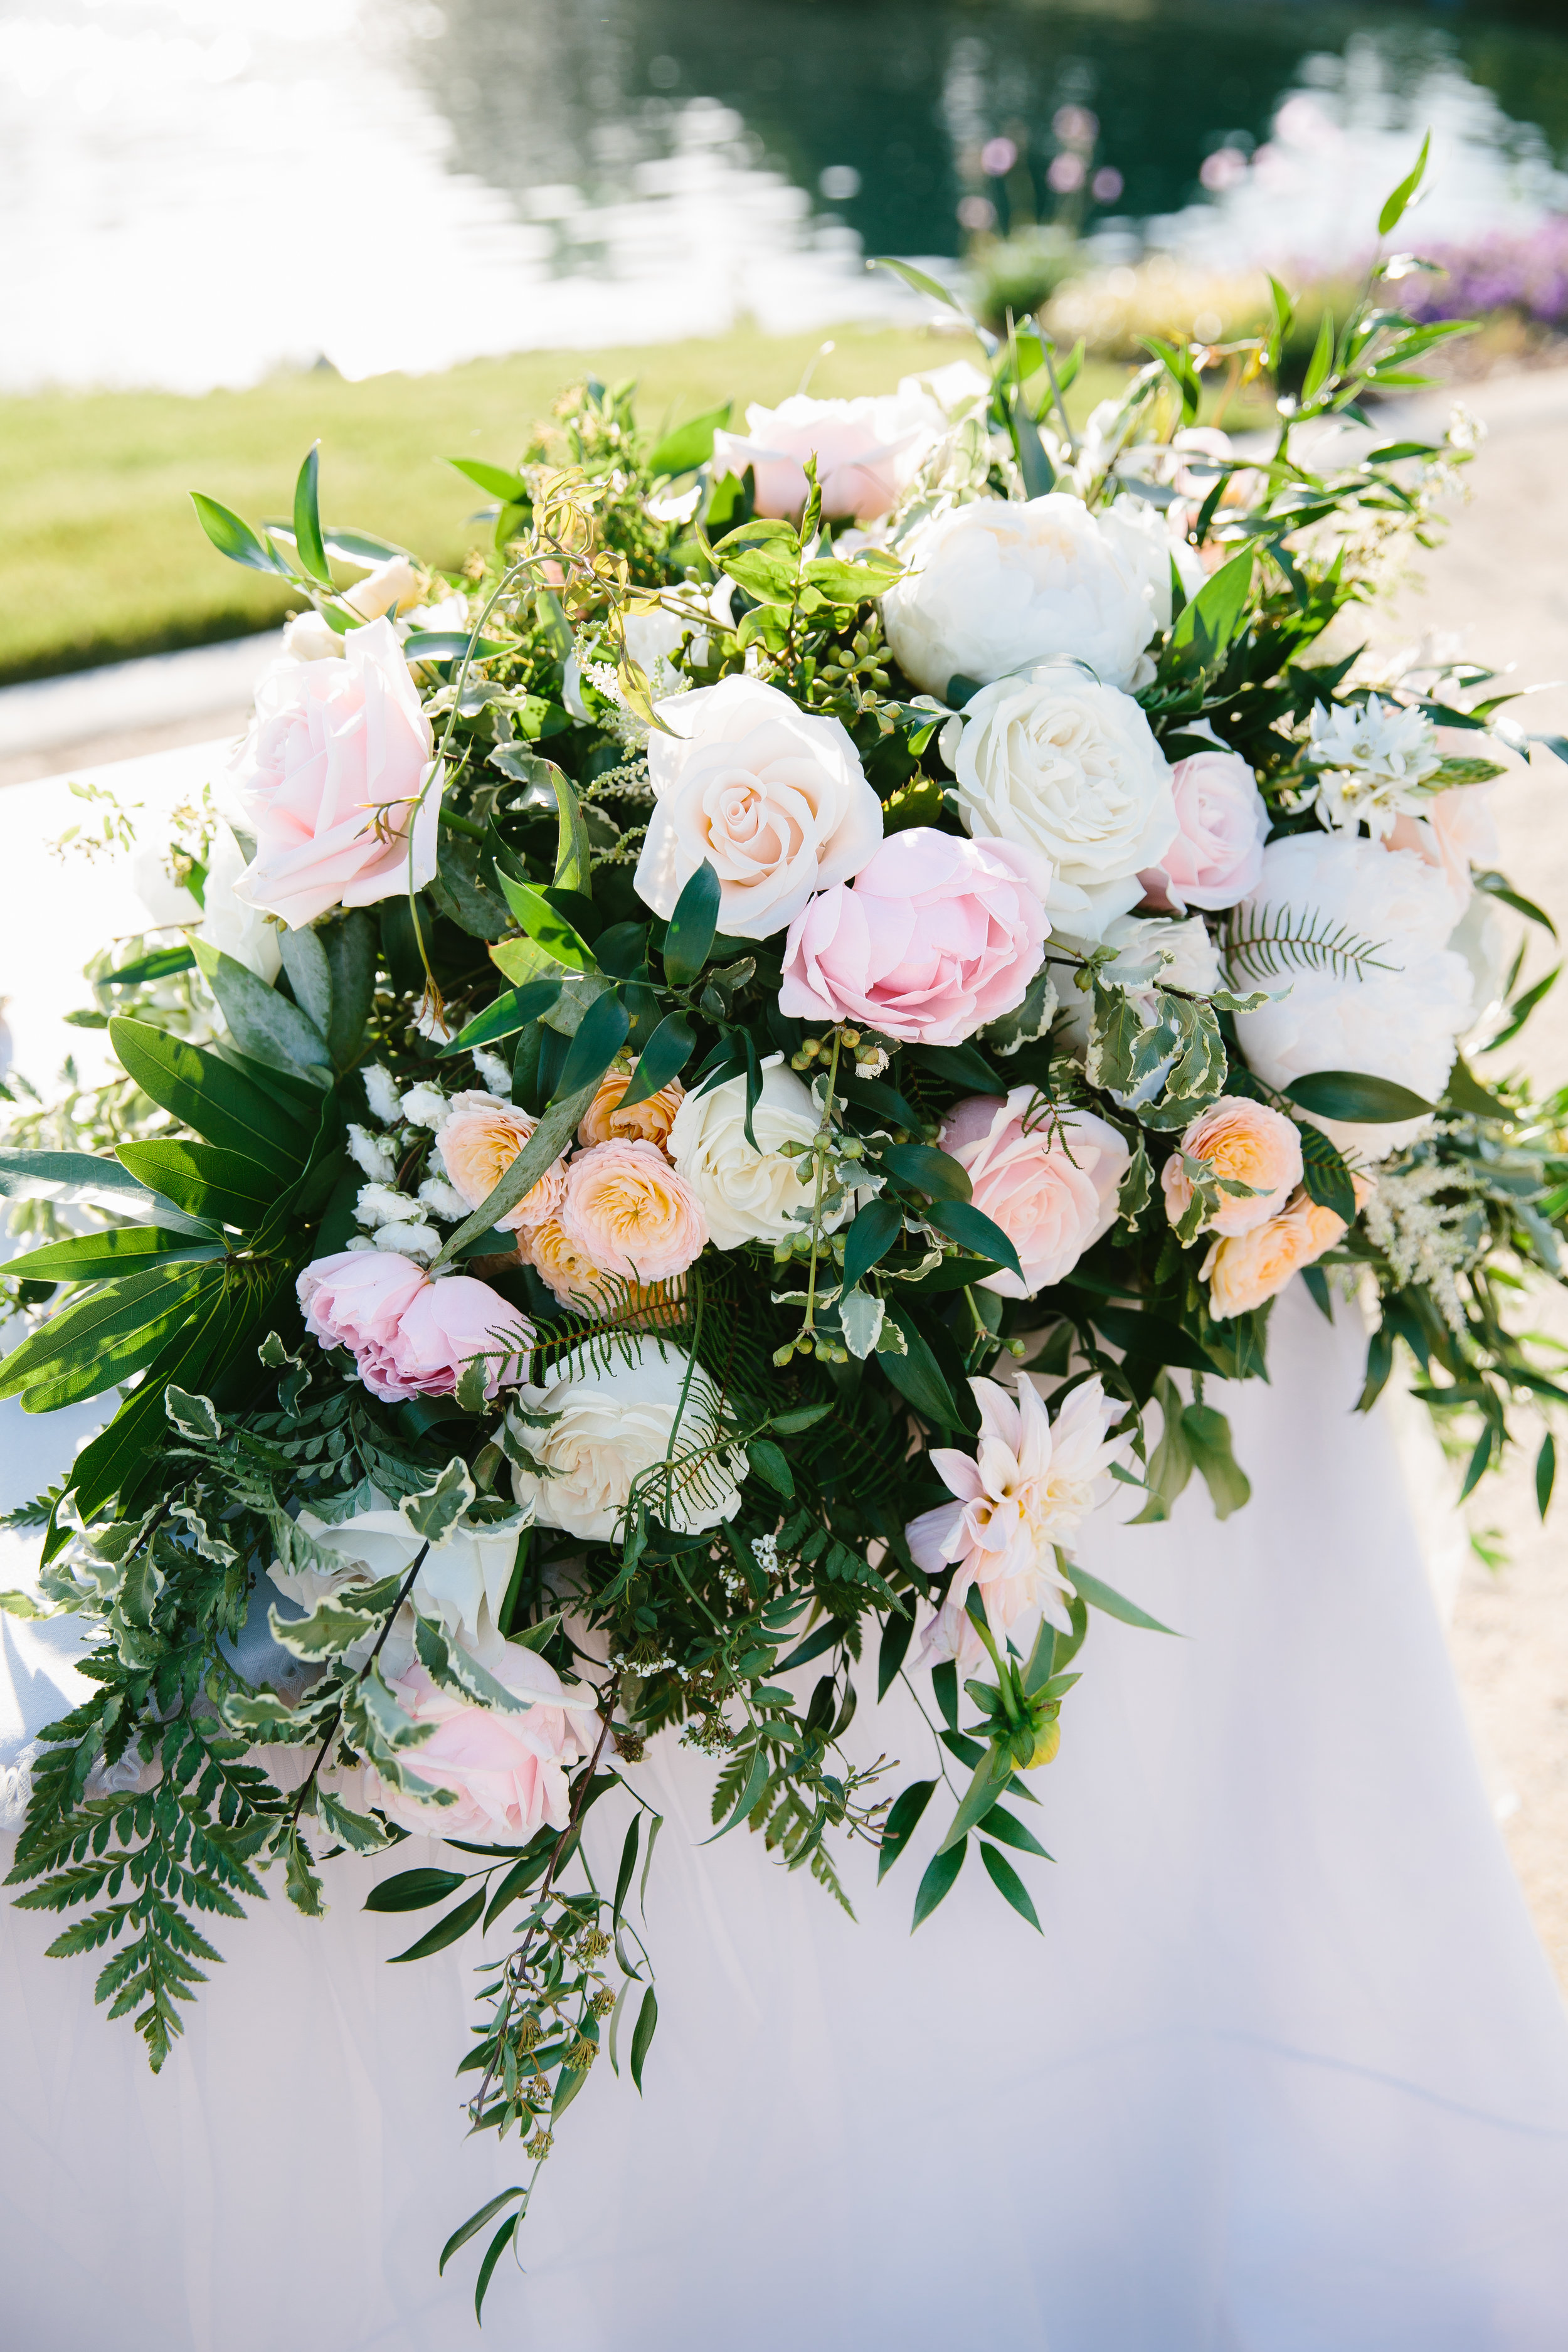 Violette-fleurs-event-design-roseville-anna-perevertaylo-rancho-robles-vinyards-California-Classic-Bride-groom-upscale-florist-sweetheart-table.jpg